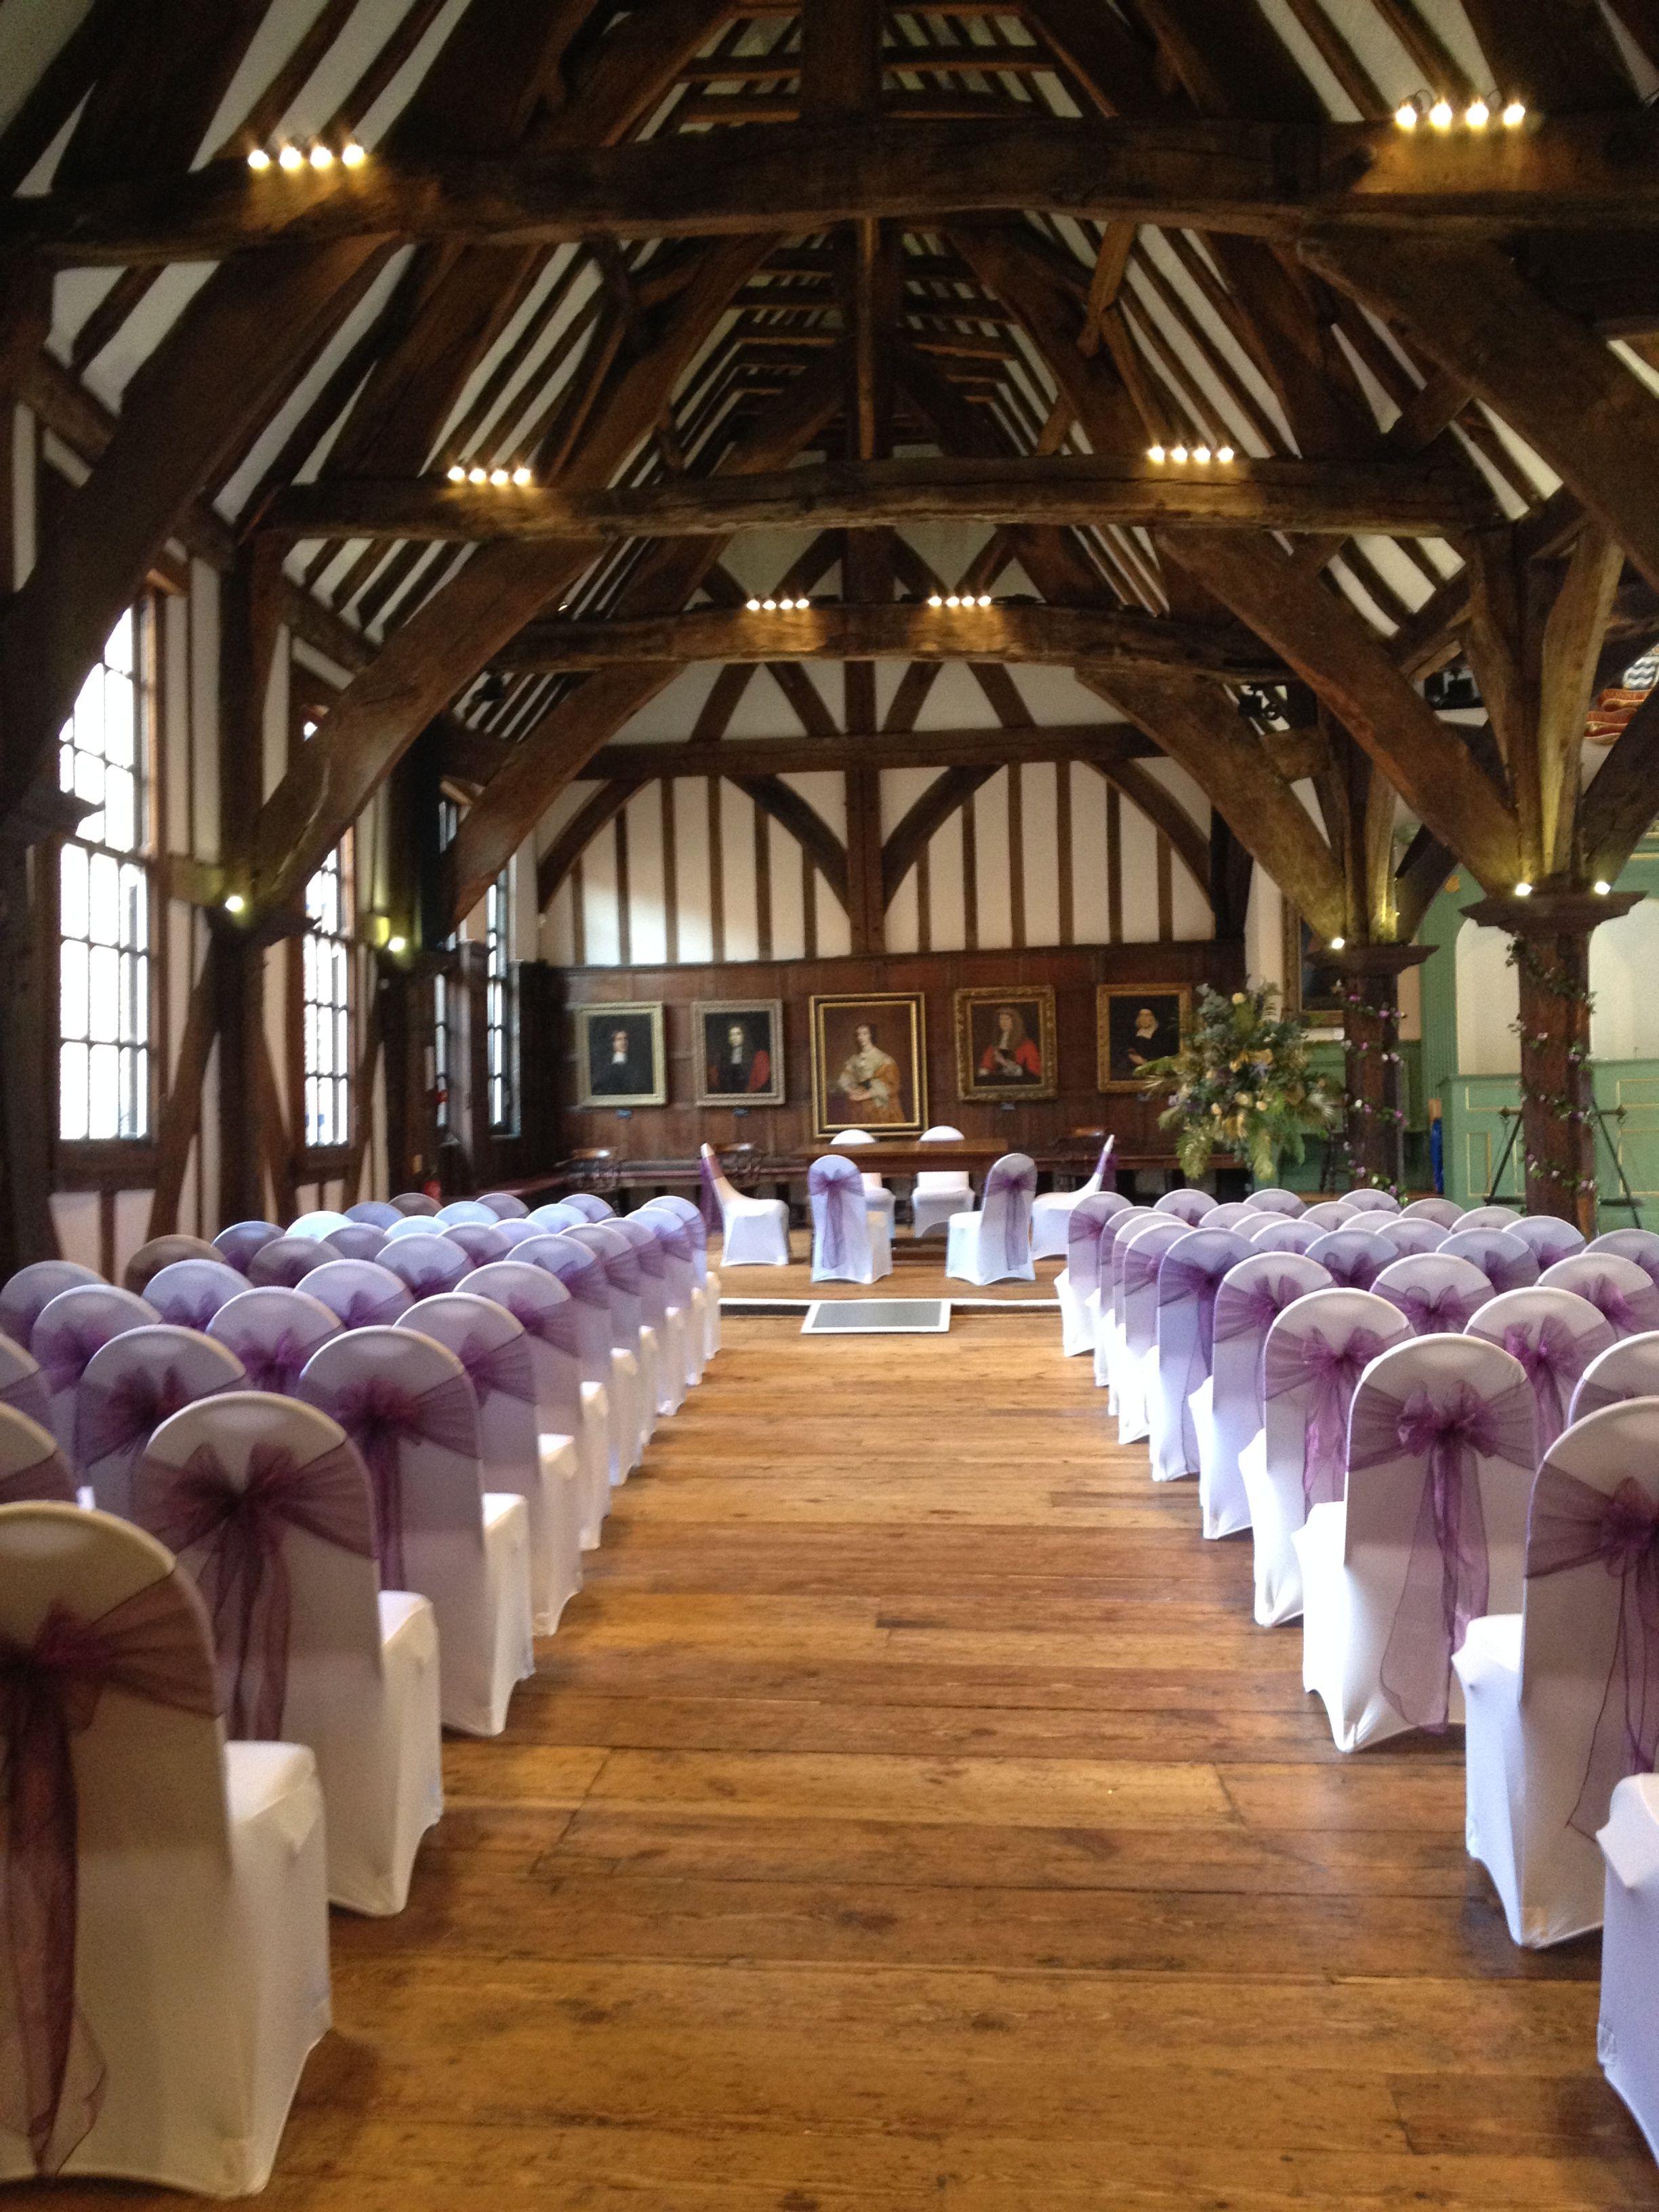 Stupendous The Merchant Adventurers Hall York Yorkshire Set For A Unemploymentrelief Wooden Chair Designs For Living Room Unemploymentrelieforg